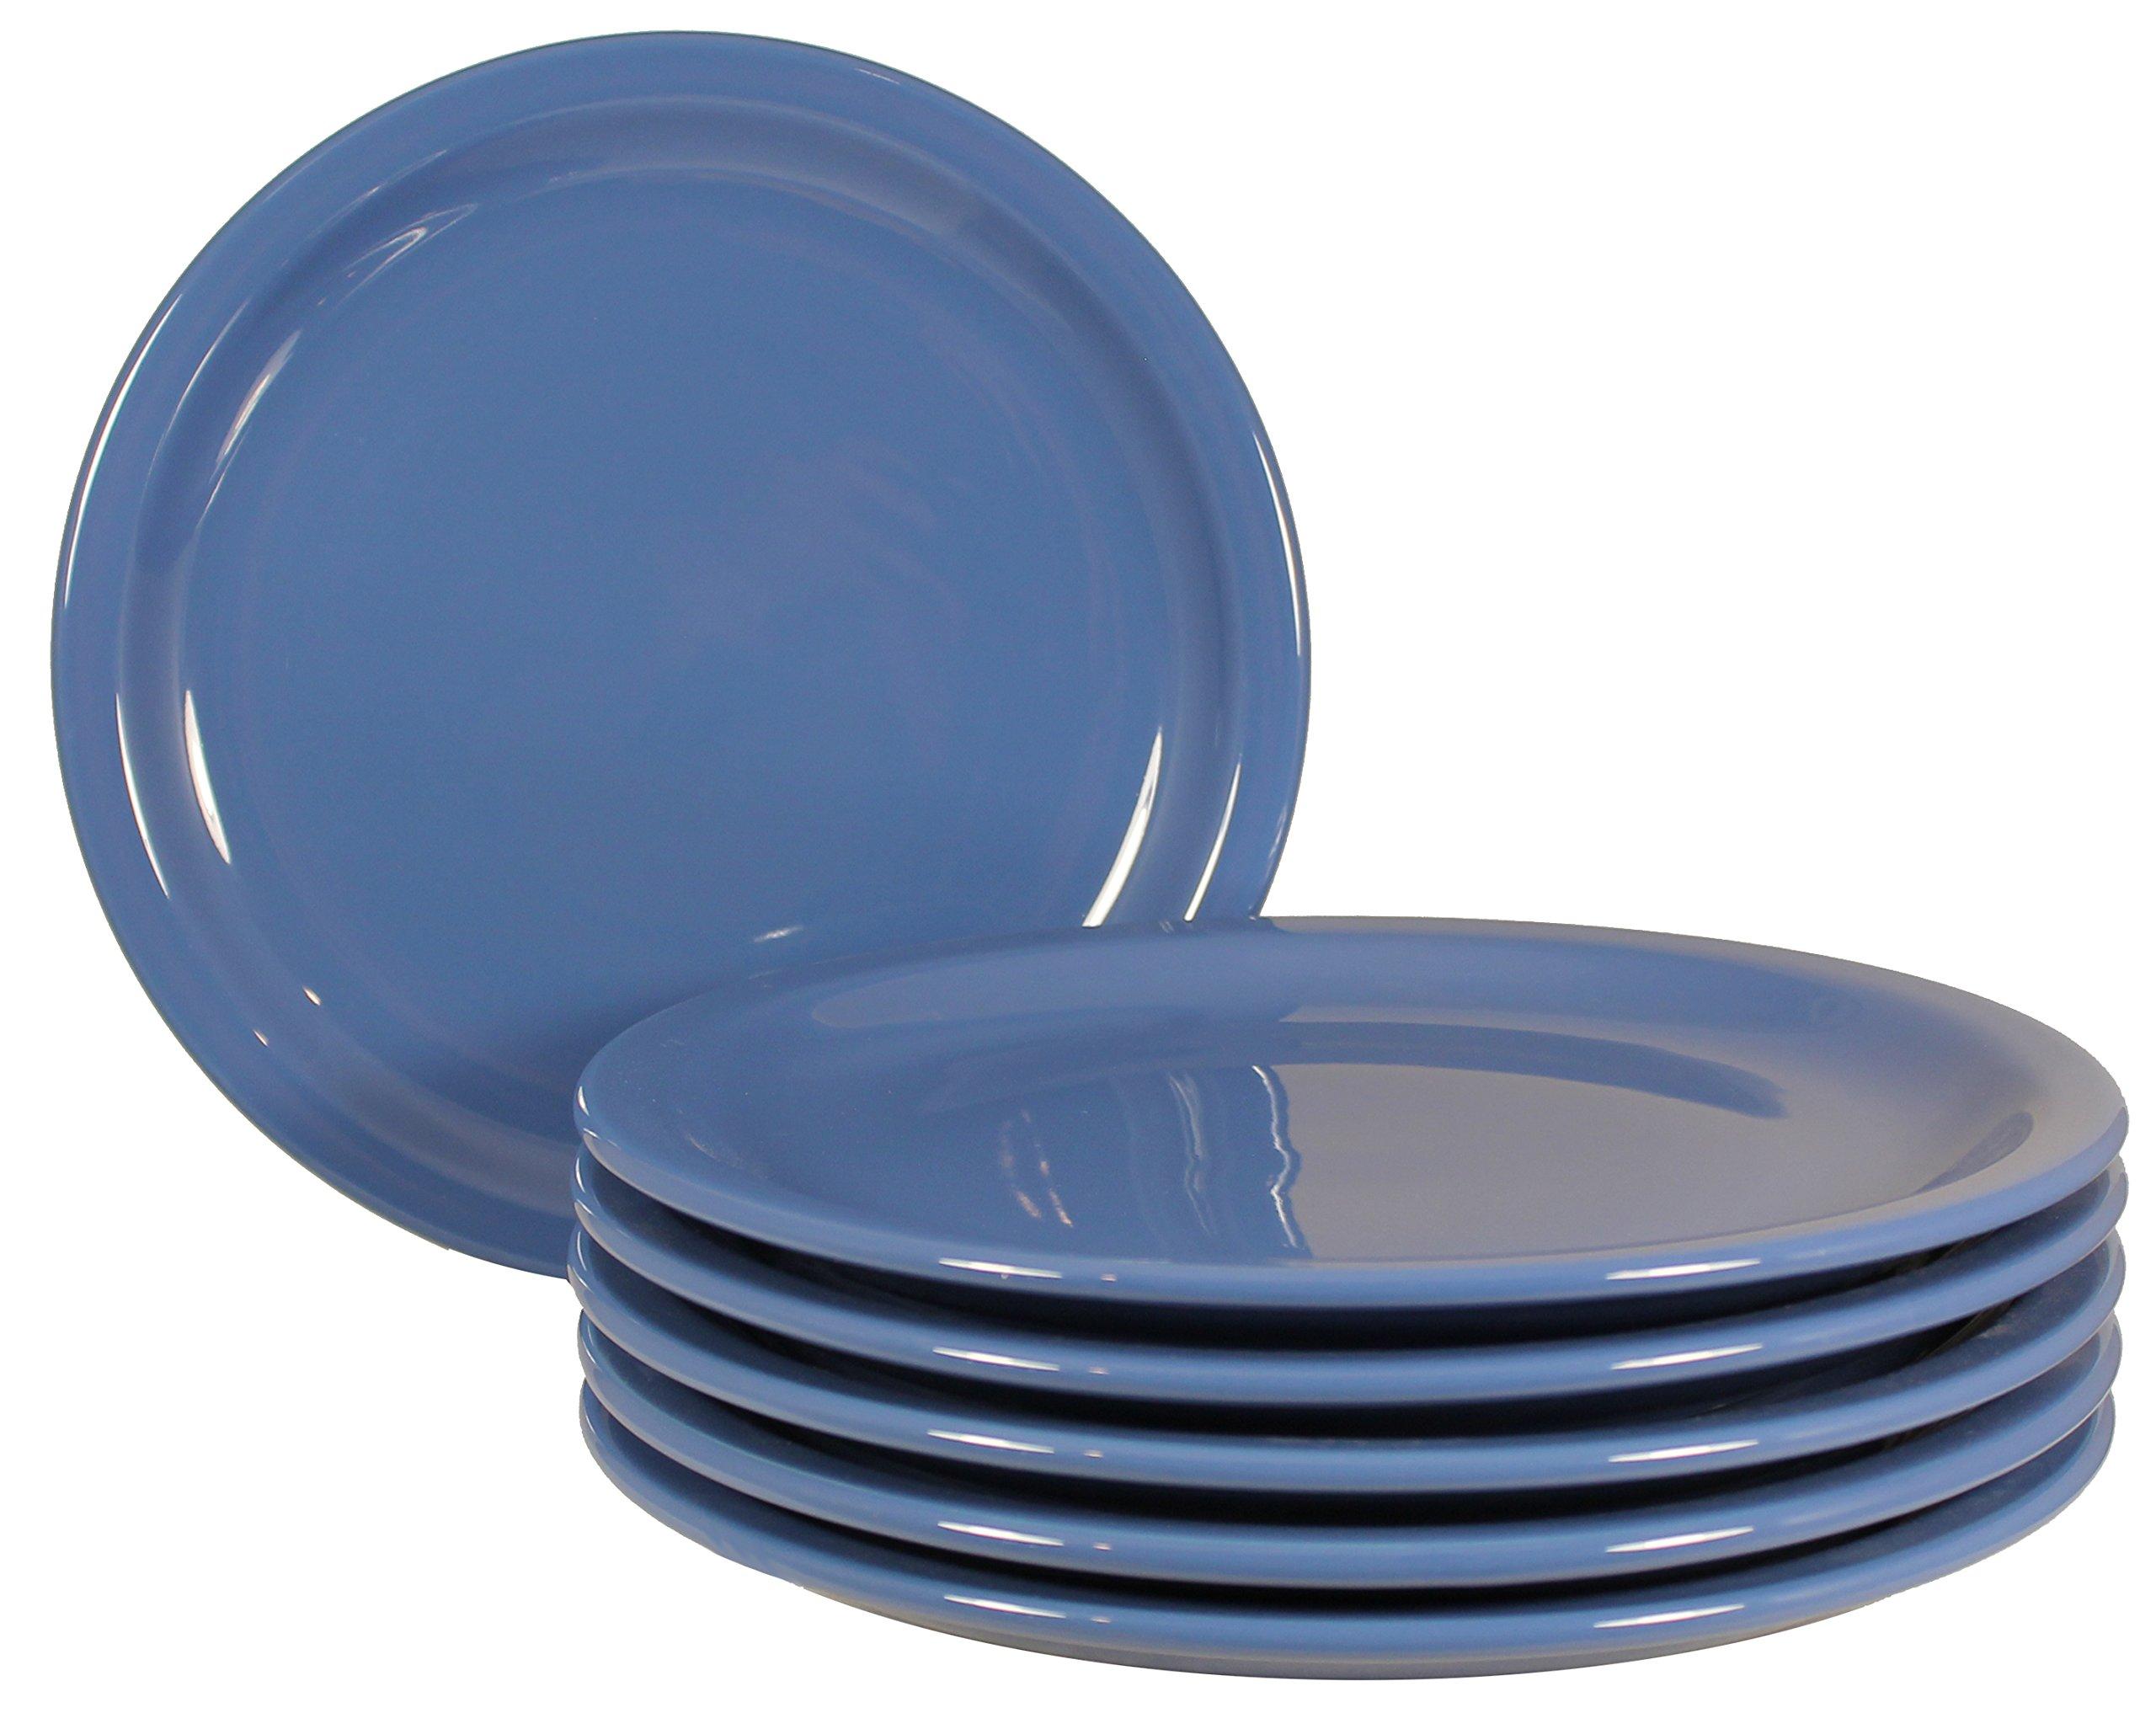 ITI Brighton Ceramic Dinner Plates with Pan Scraper, 6-Pack (9 Inch, Blue)